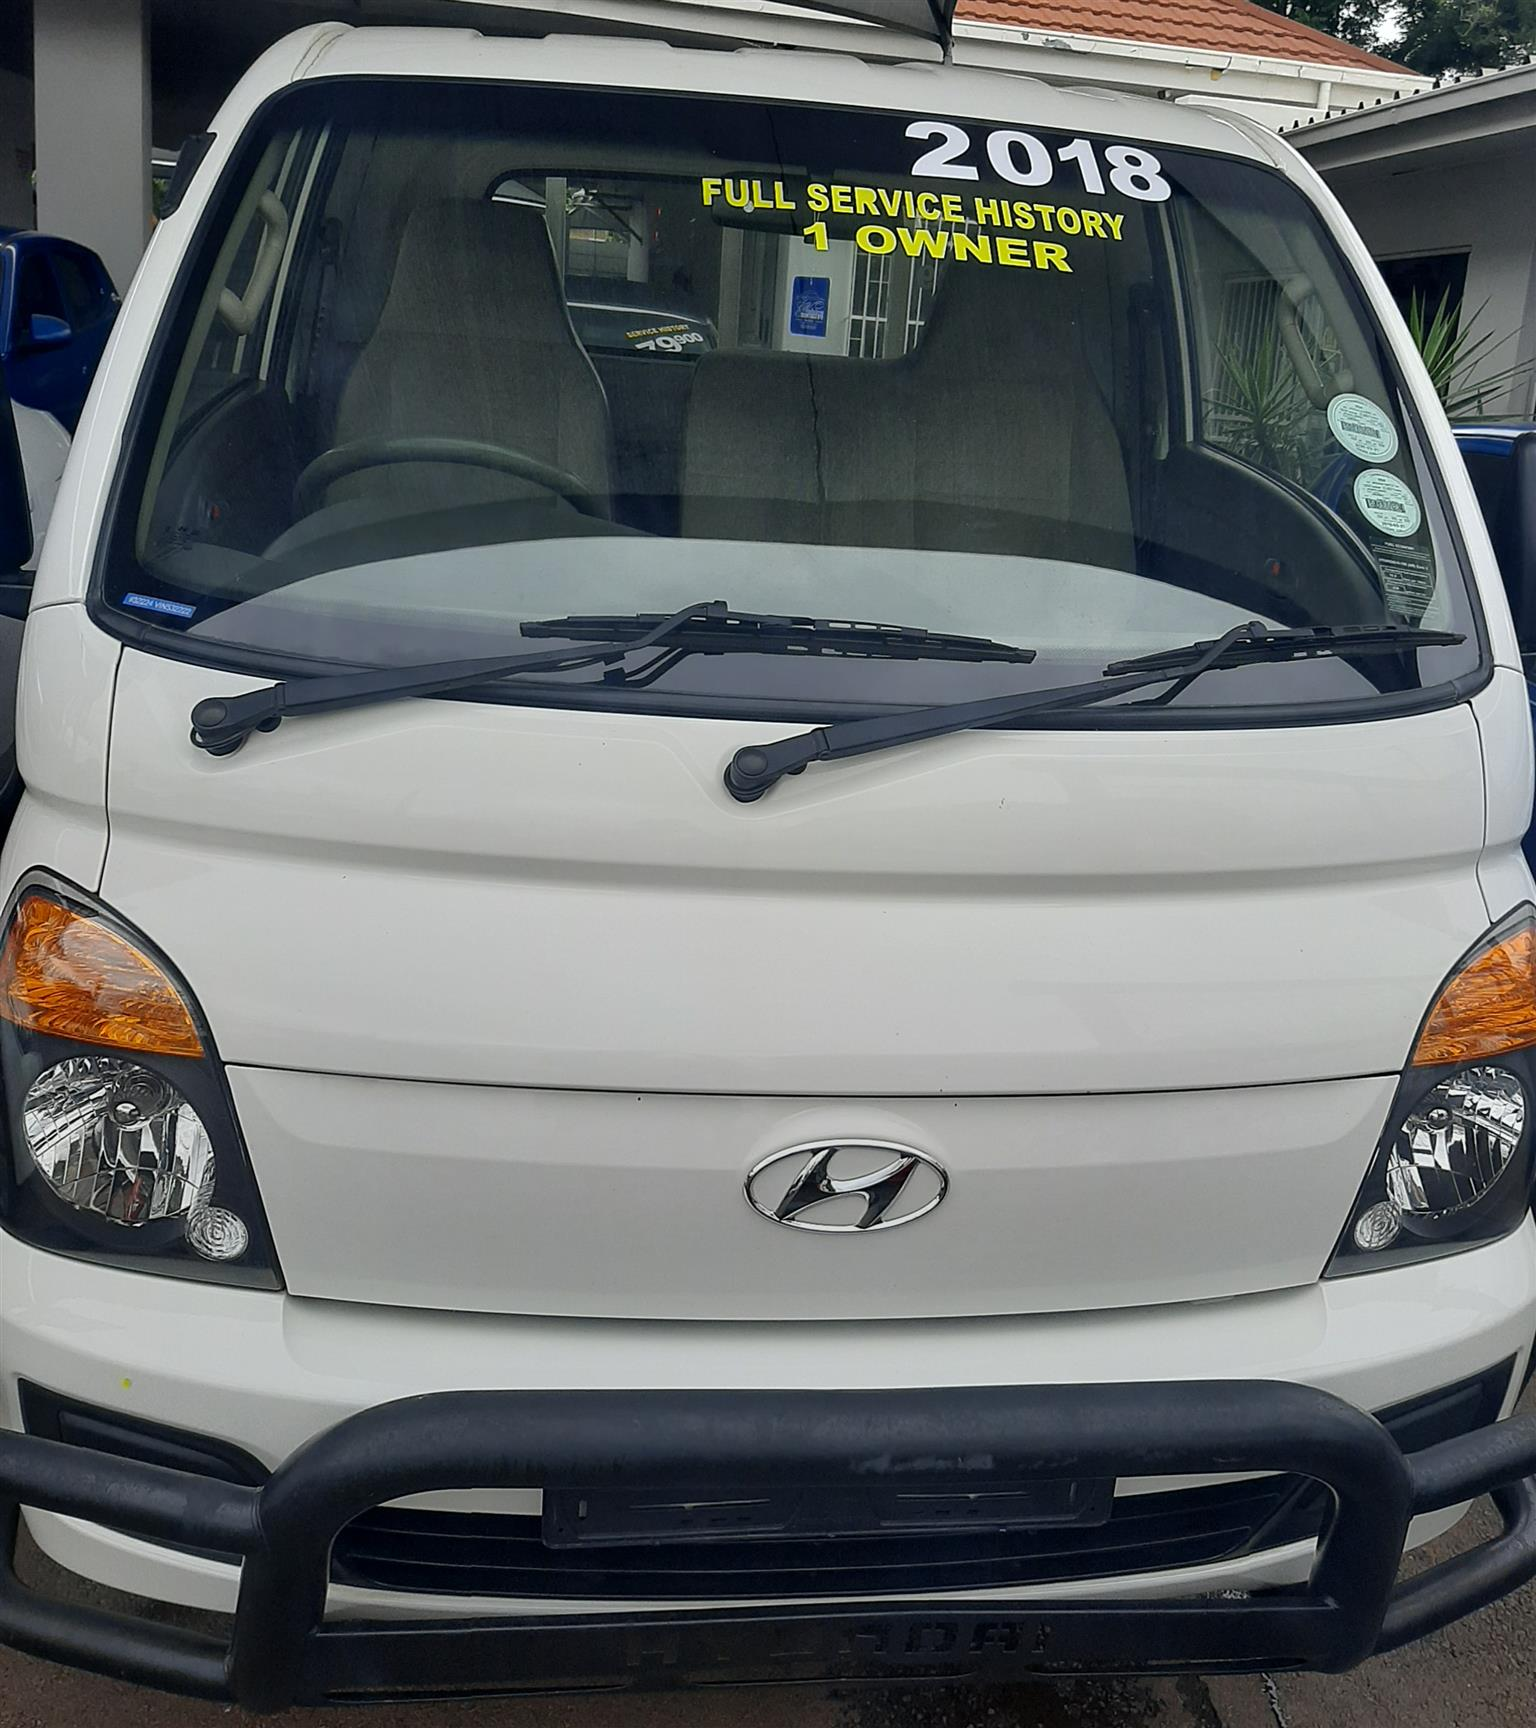 2018 Hyundai H-100 Bakkie 2.5TCi chassis cab